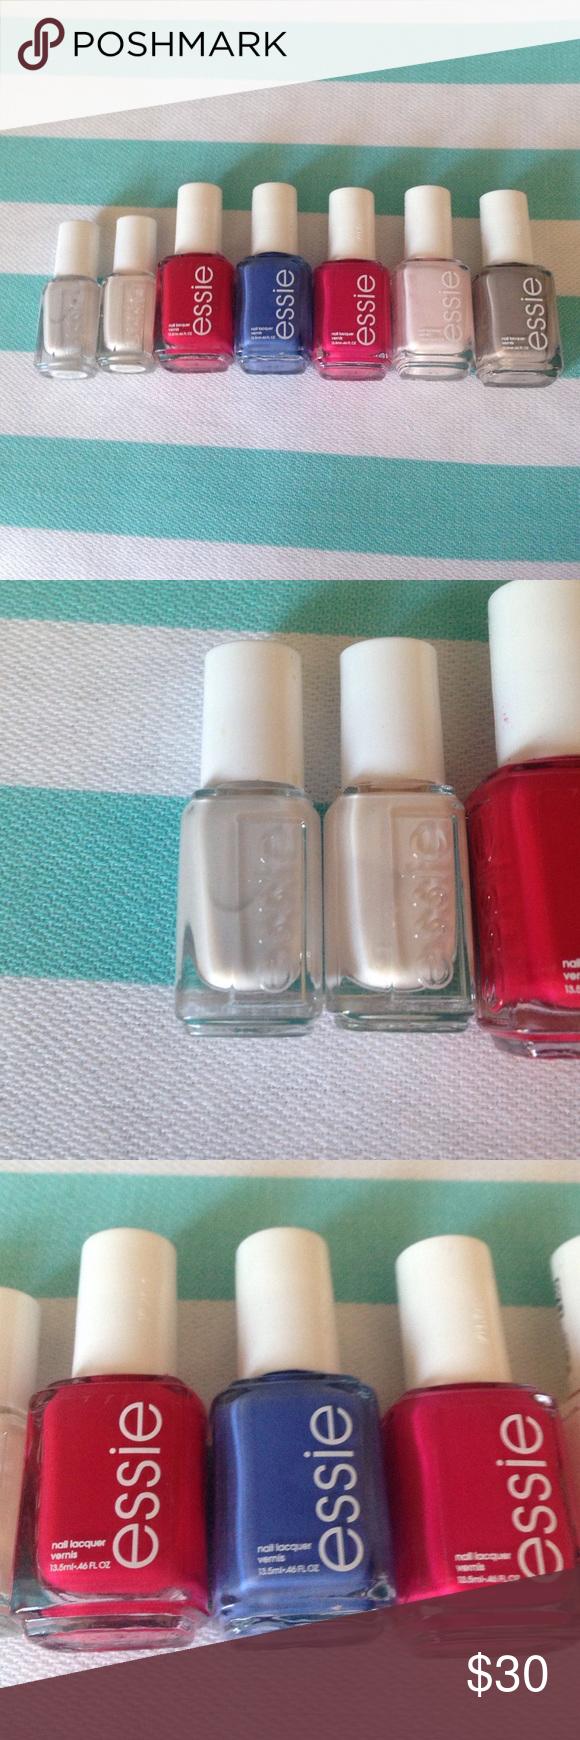 Essie nail polish bundle   Essie nail polish, Small bottles and ...